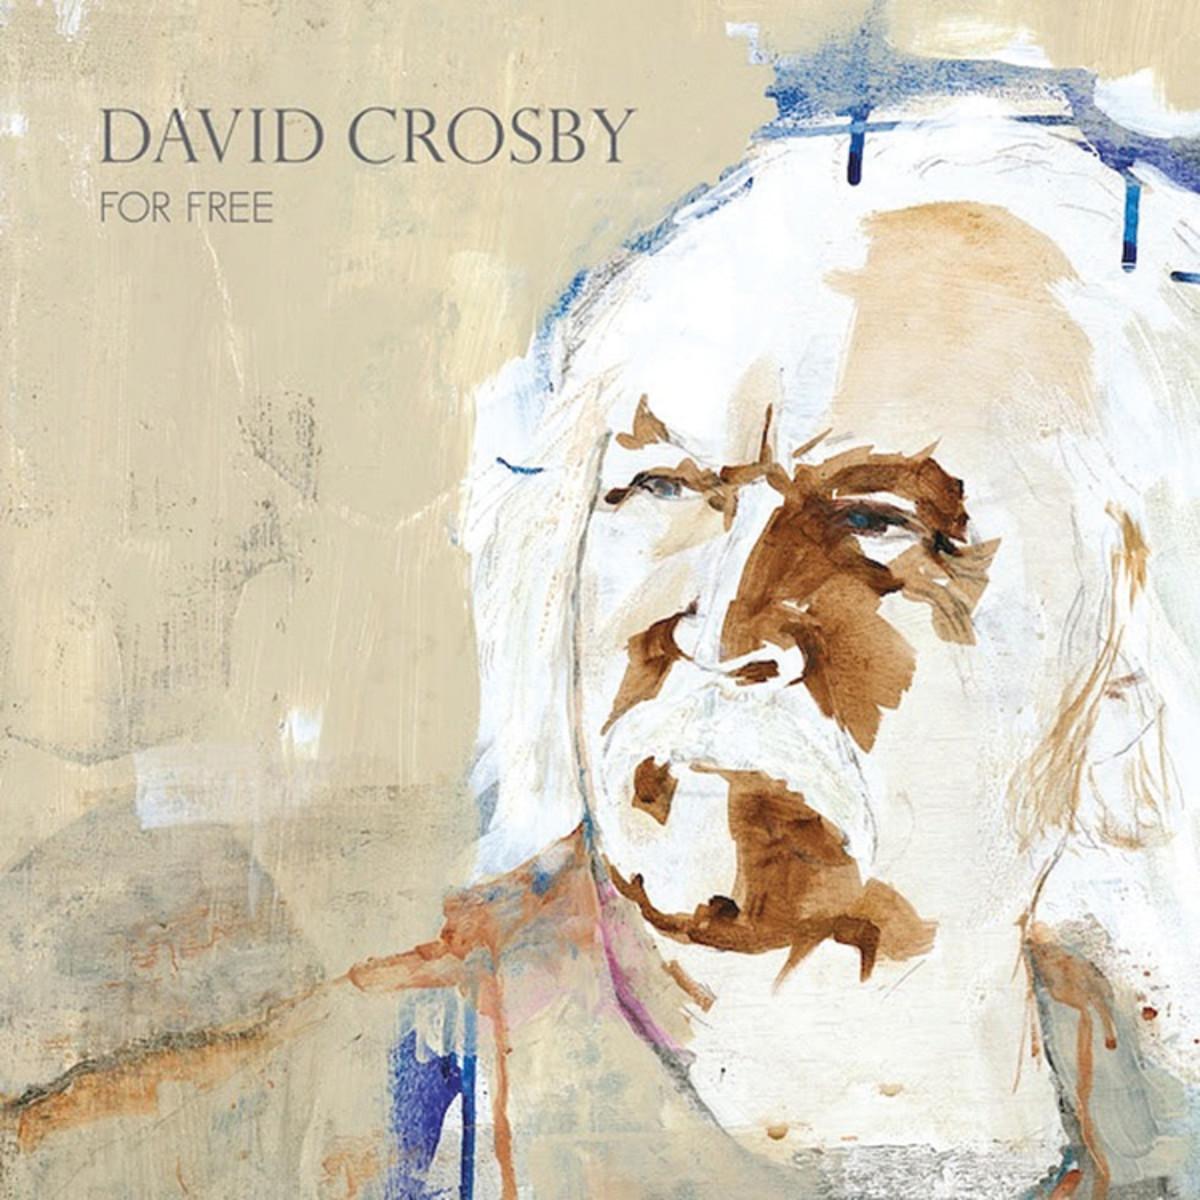 david-crosby-for-free_c